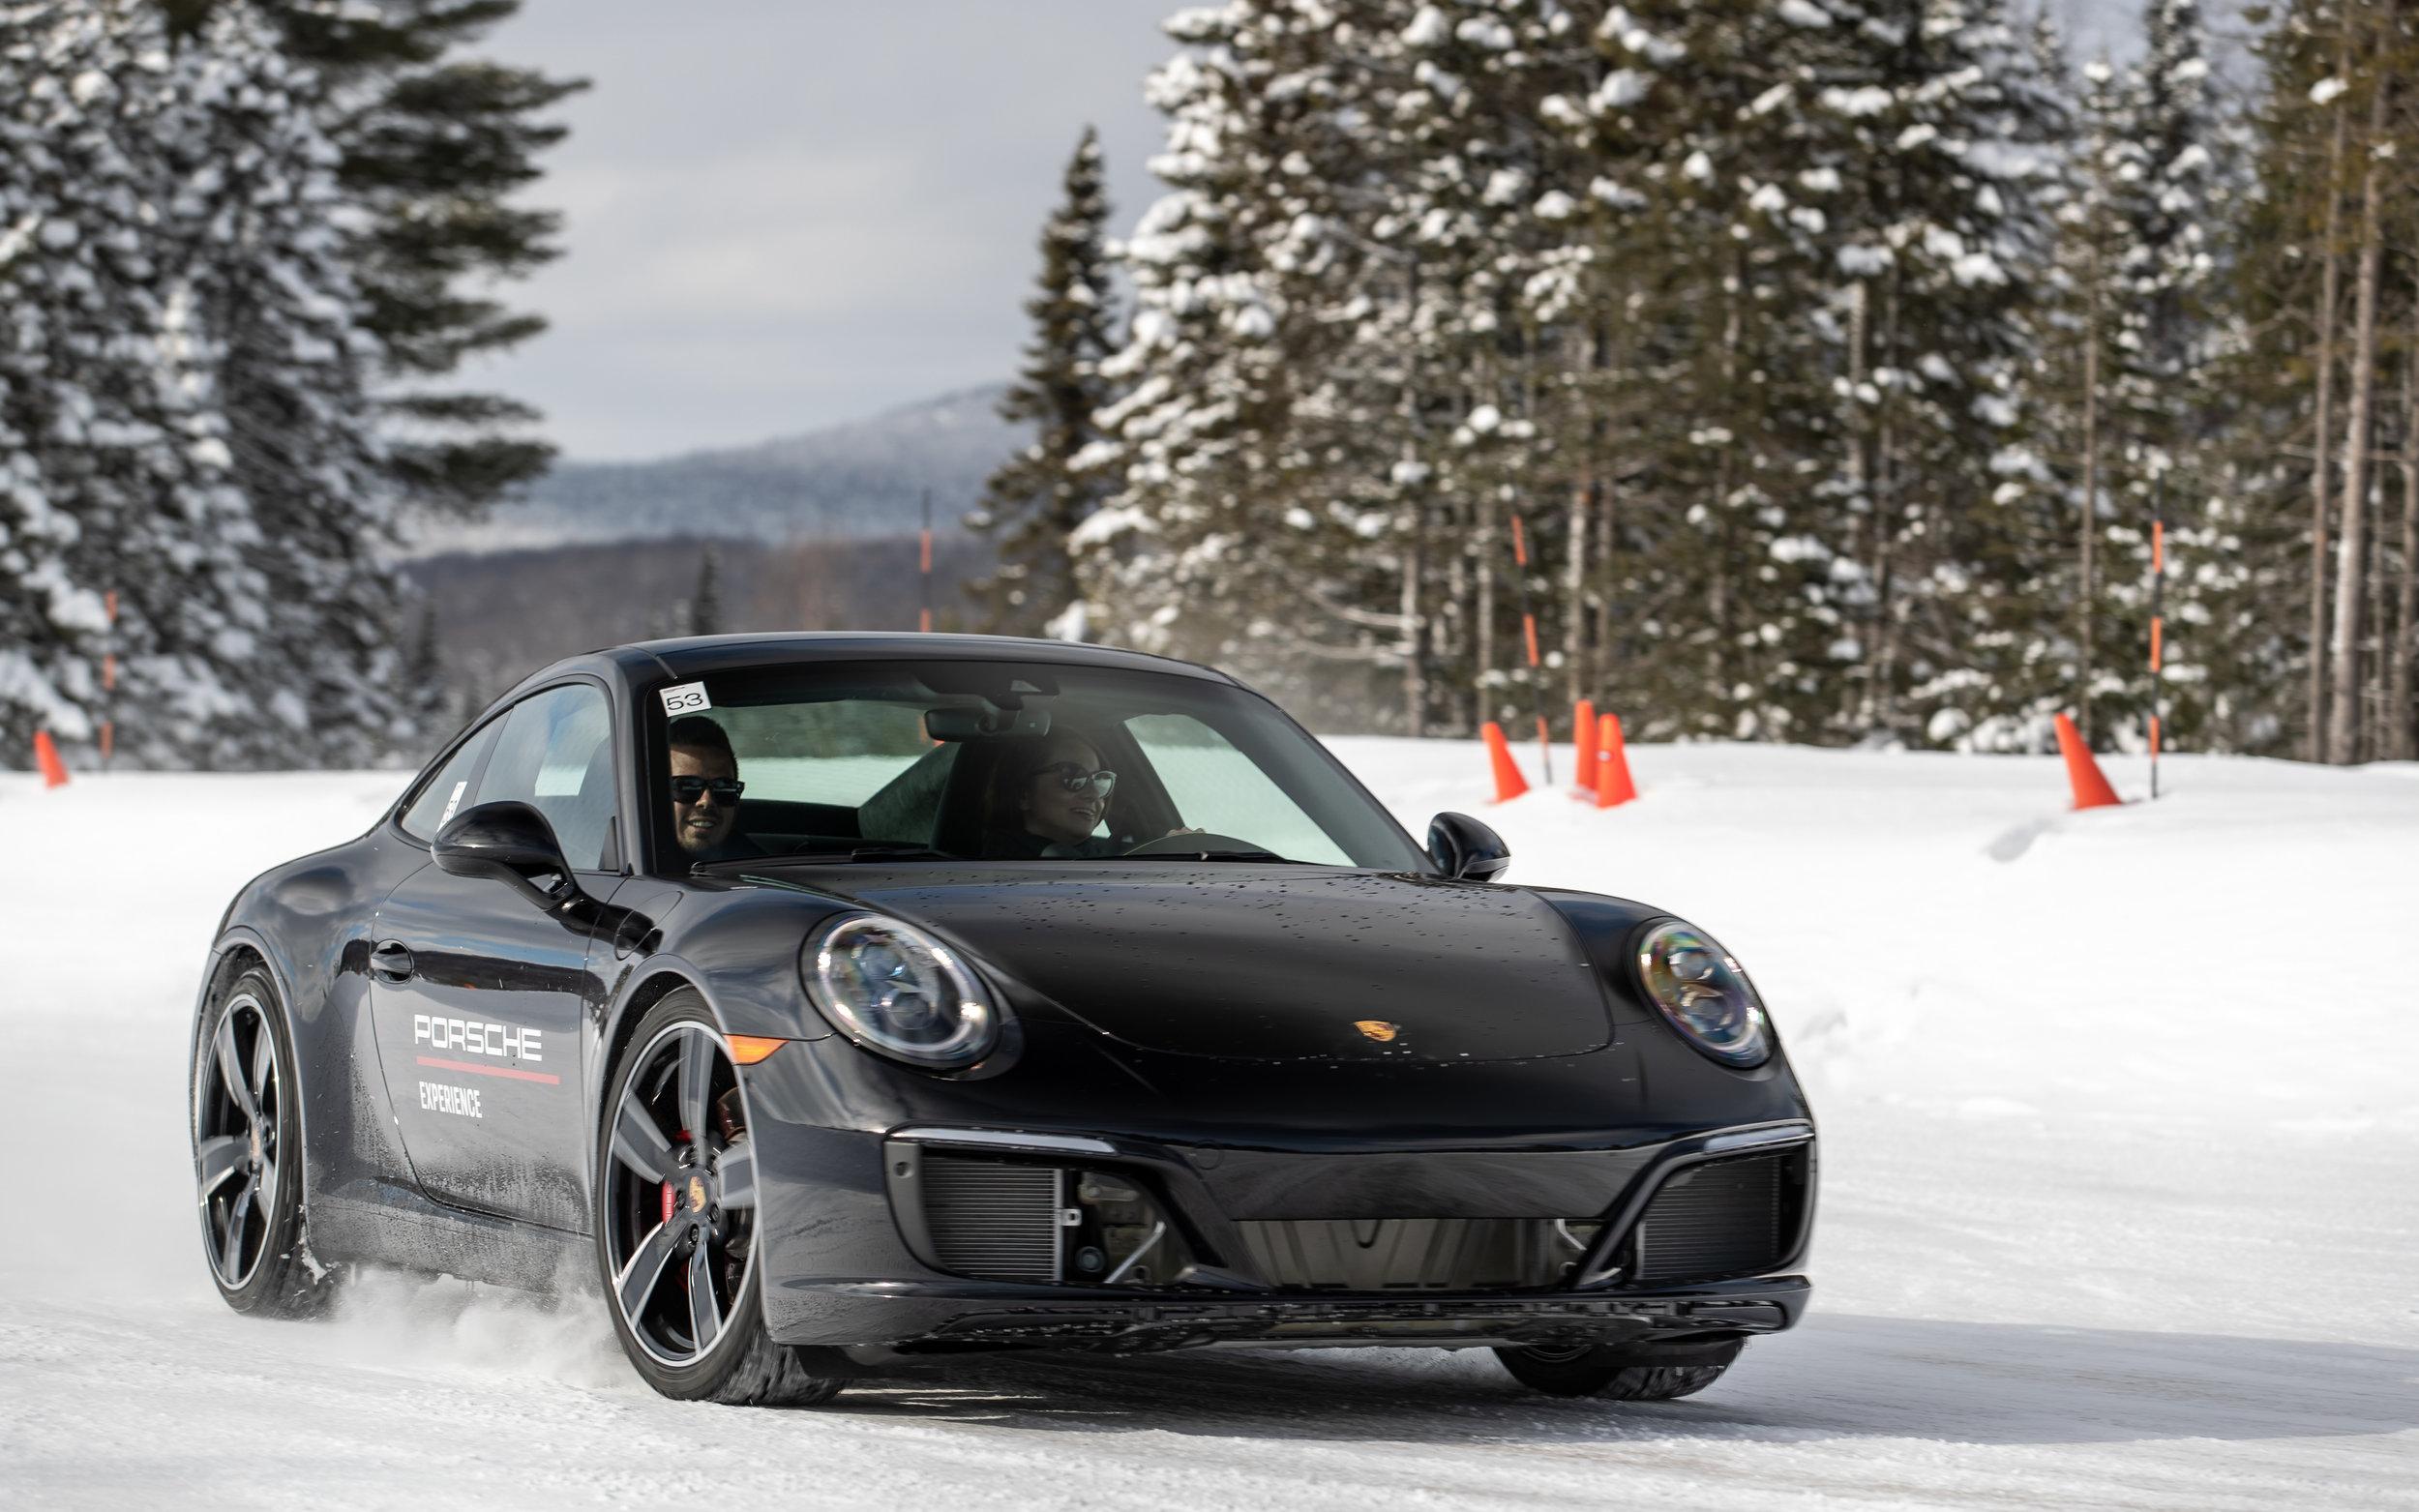 Porsche-Ice-Experience-Canada-Media-91.jpg